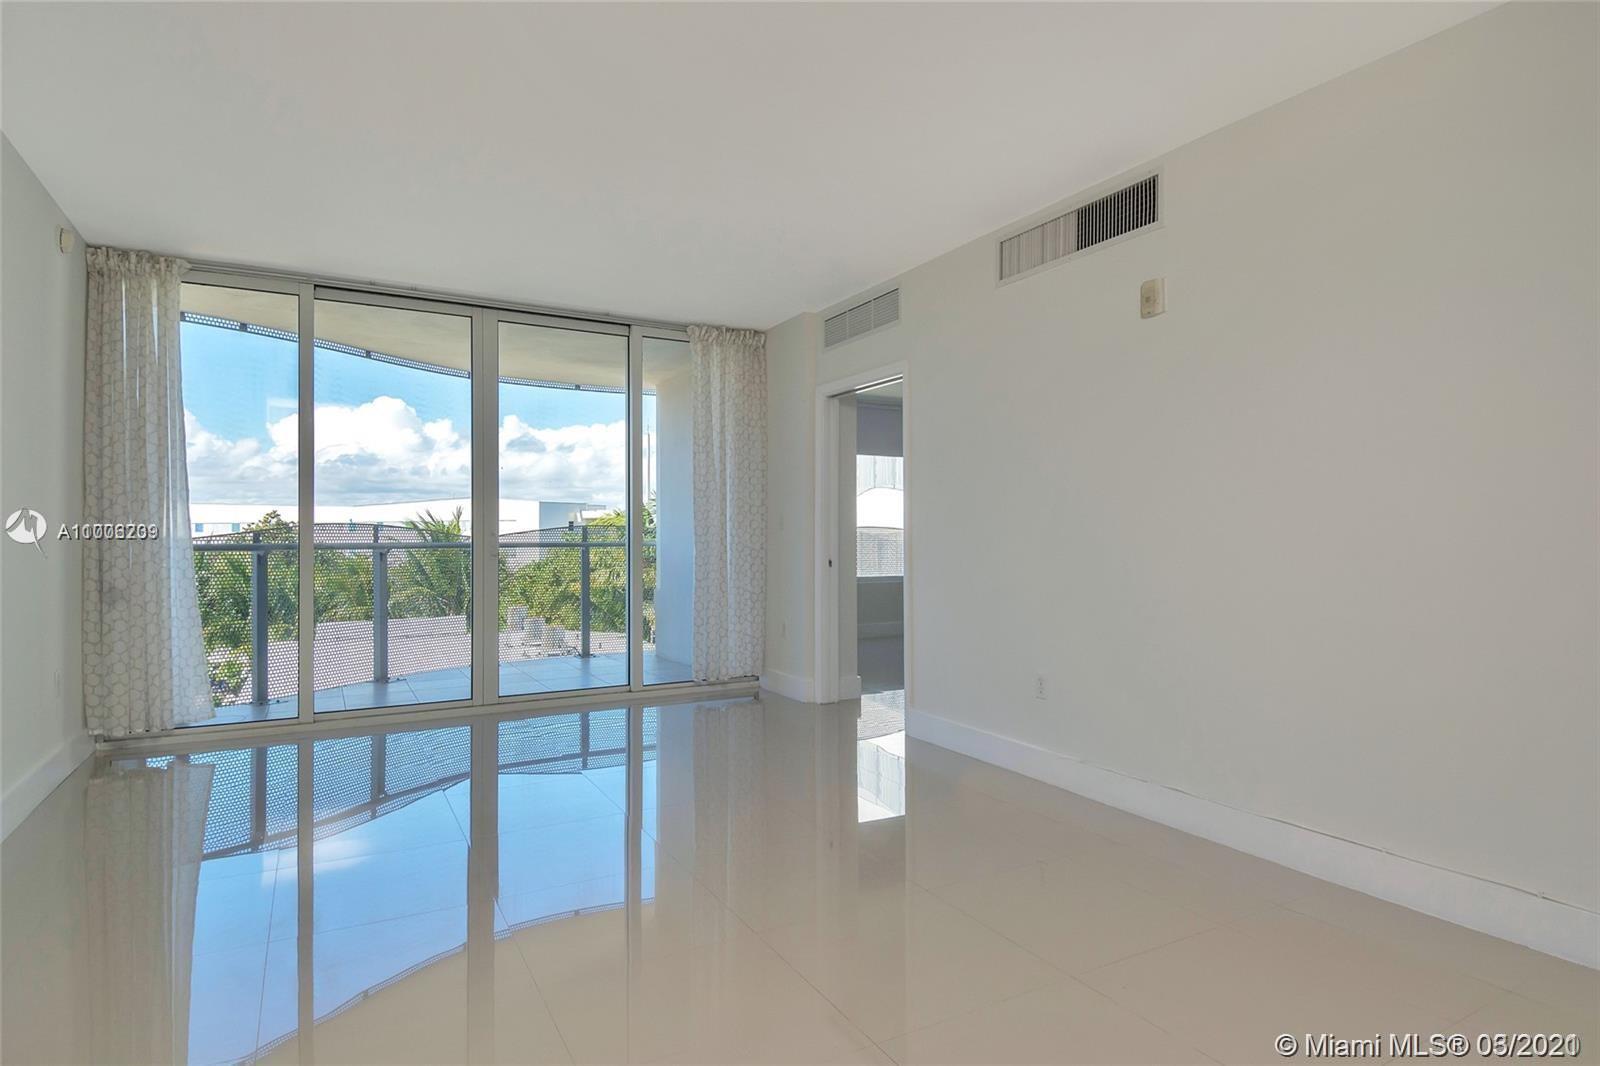 Artepark North #406 - 2155 Washington Ct #406, Miami Beach, FL 33139